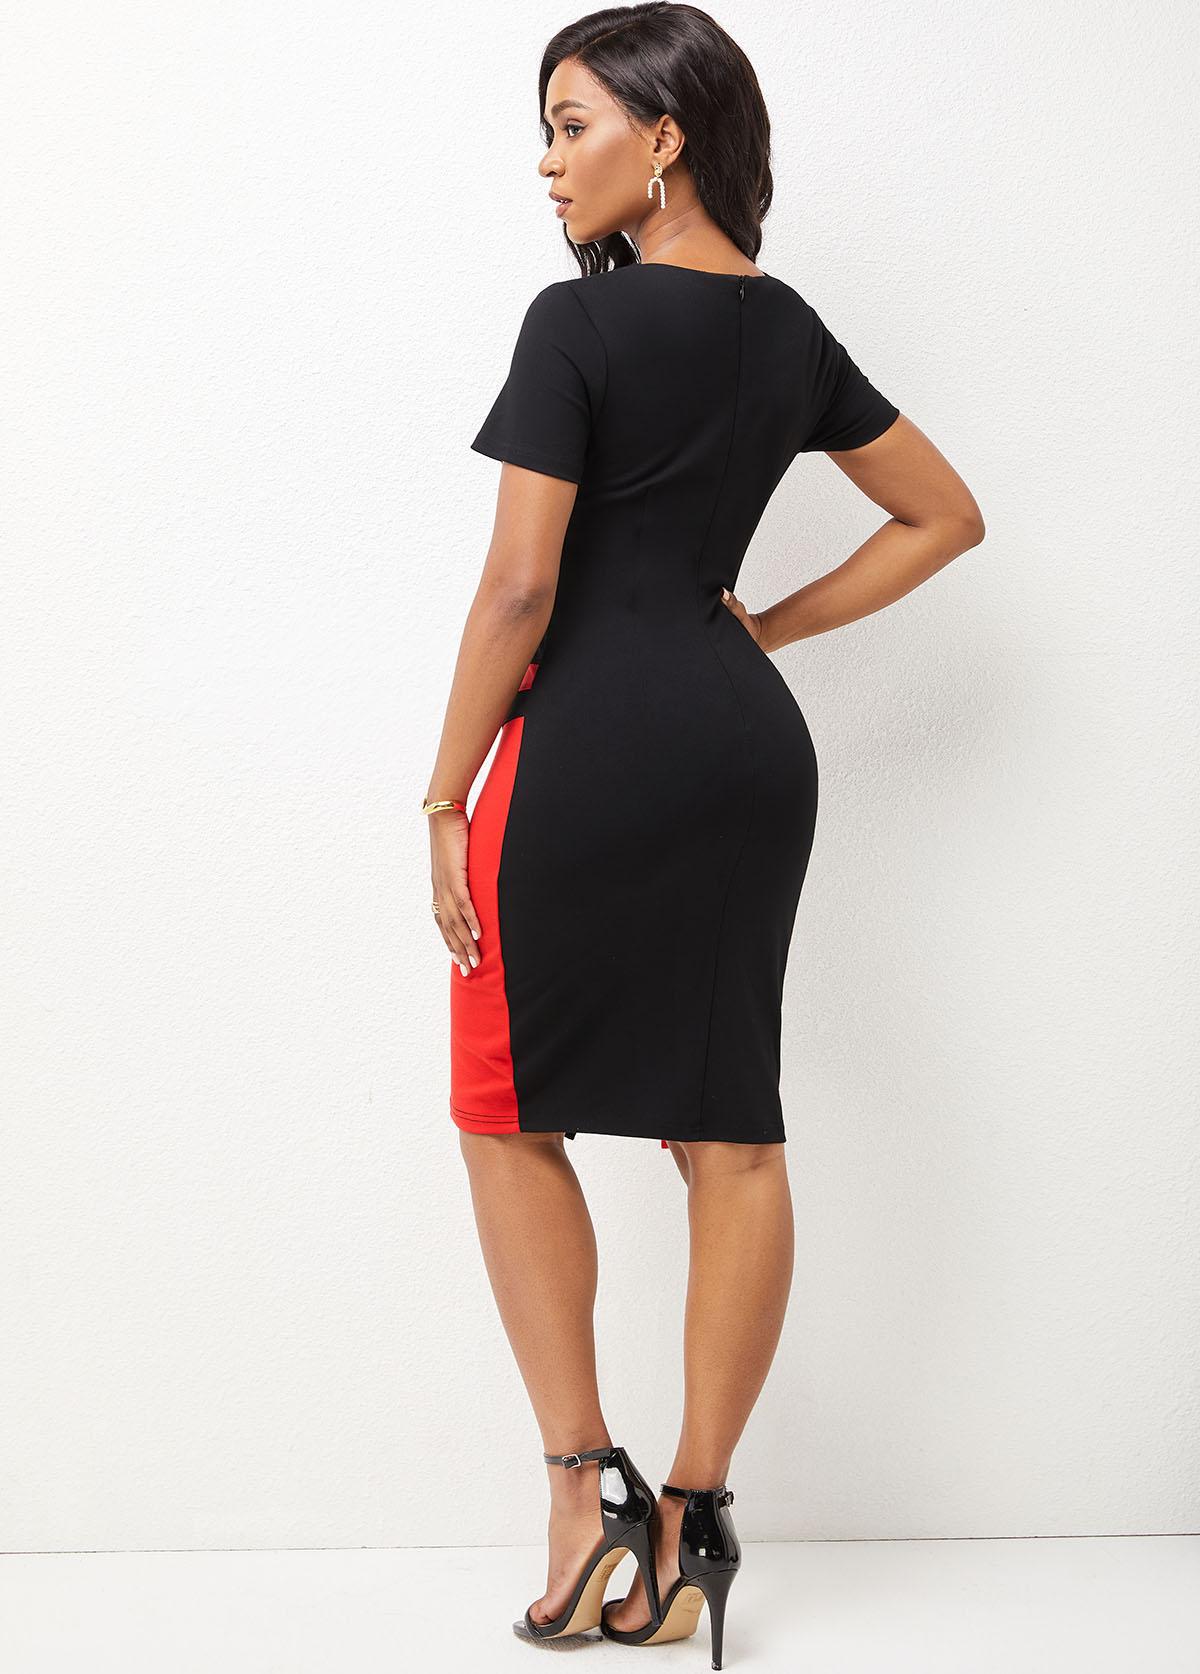 Contrast Keyhole Neckline Short Sleeve Dress